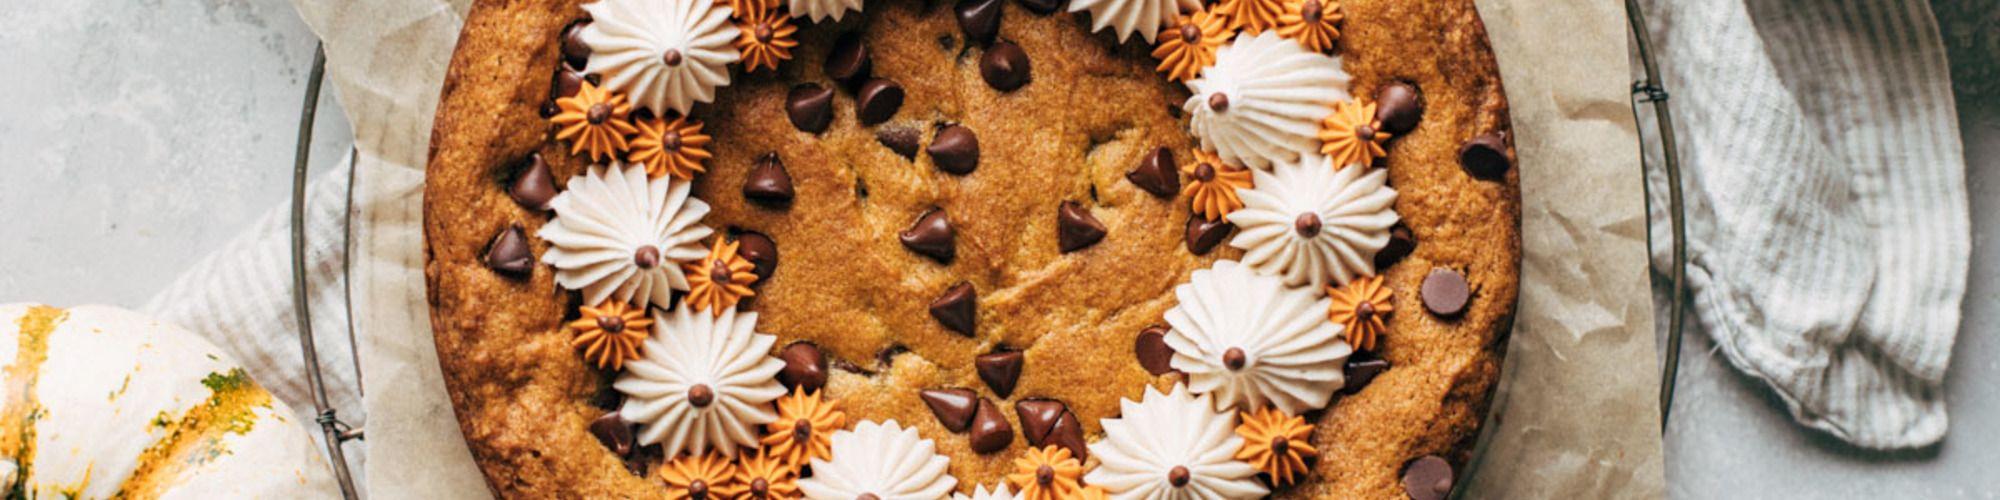 Pumpkin Chocolate Chip Cookie Cake C H Sugar Recipe In 2020 Pumpkin Chocolate Chip Cookies Pumpkin Chocolate Chips Pumpkin Chocolate